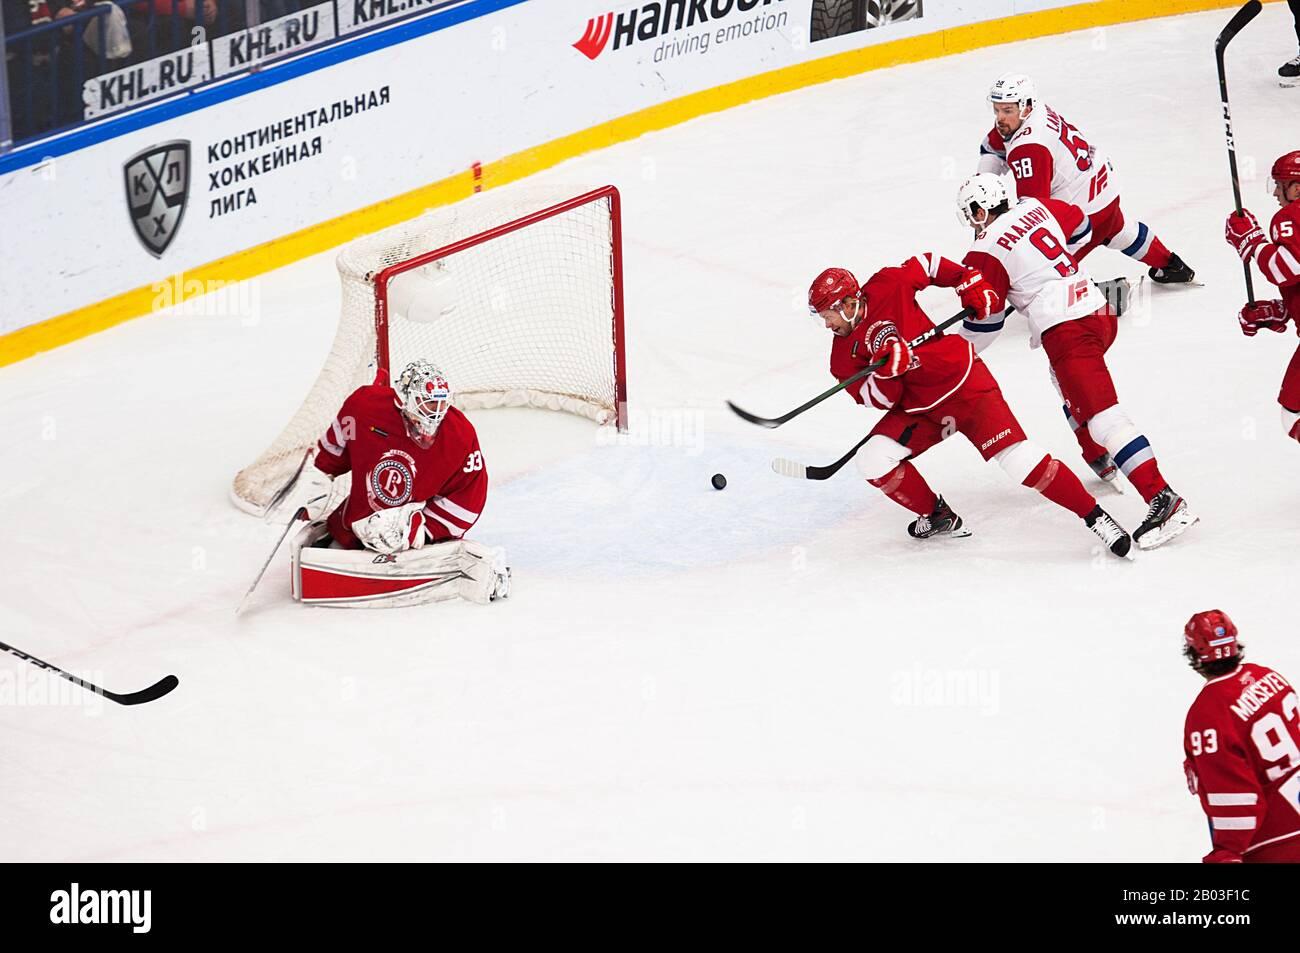 Podolsk, RUSSLAND - 25. JANUAR 2020: Score Scene on Hockey Game Vityaz vs. Lokomotiv on Russia KHL Championship in Podolsk, Russland. Lokomotiv gewann 5:2 Stockfoto